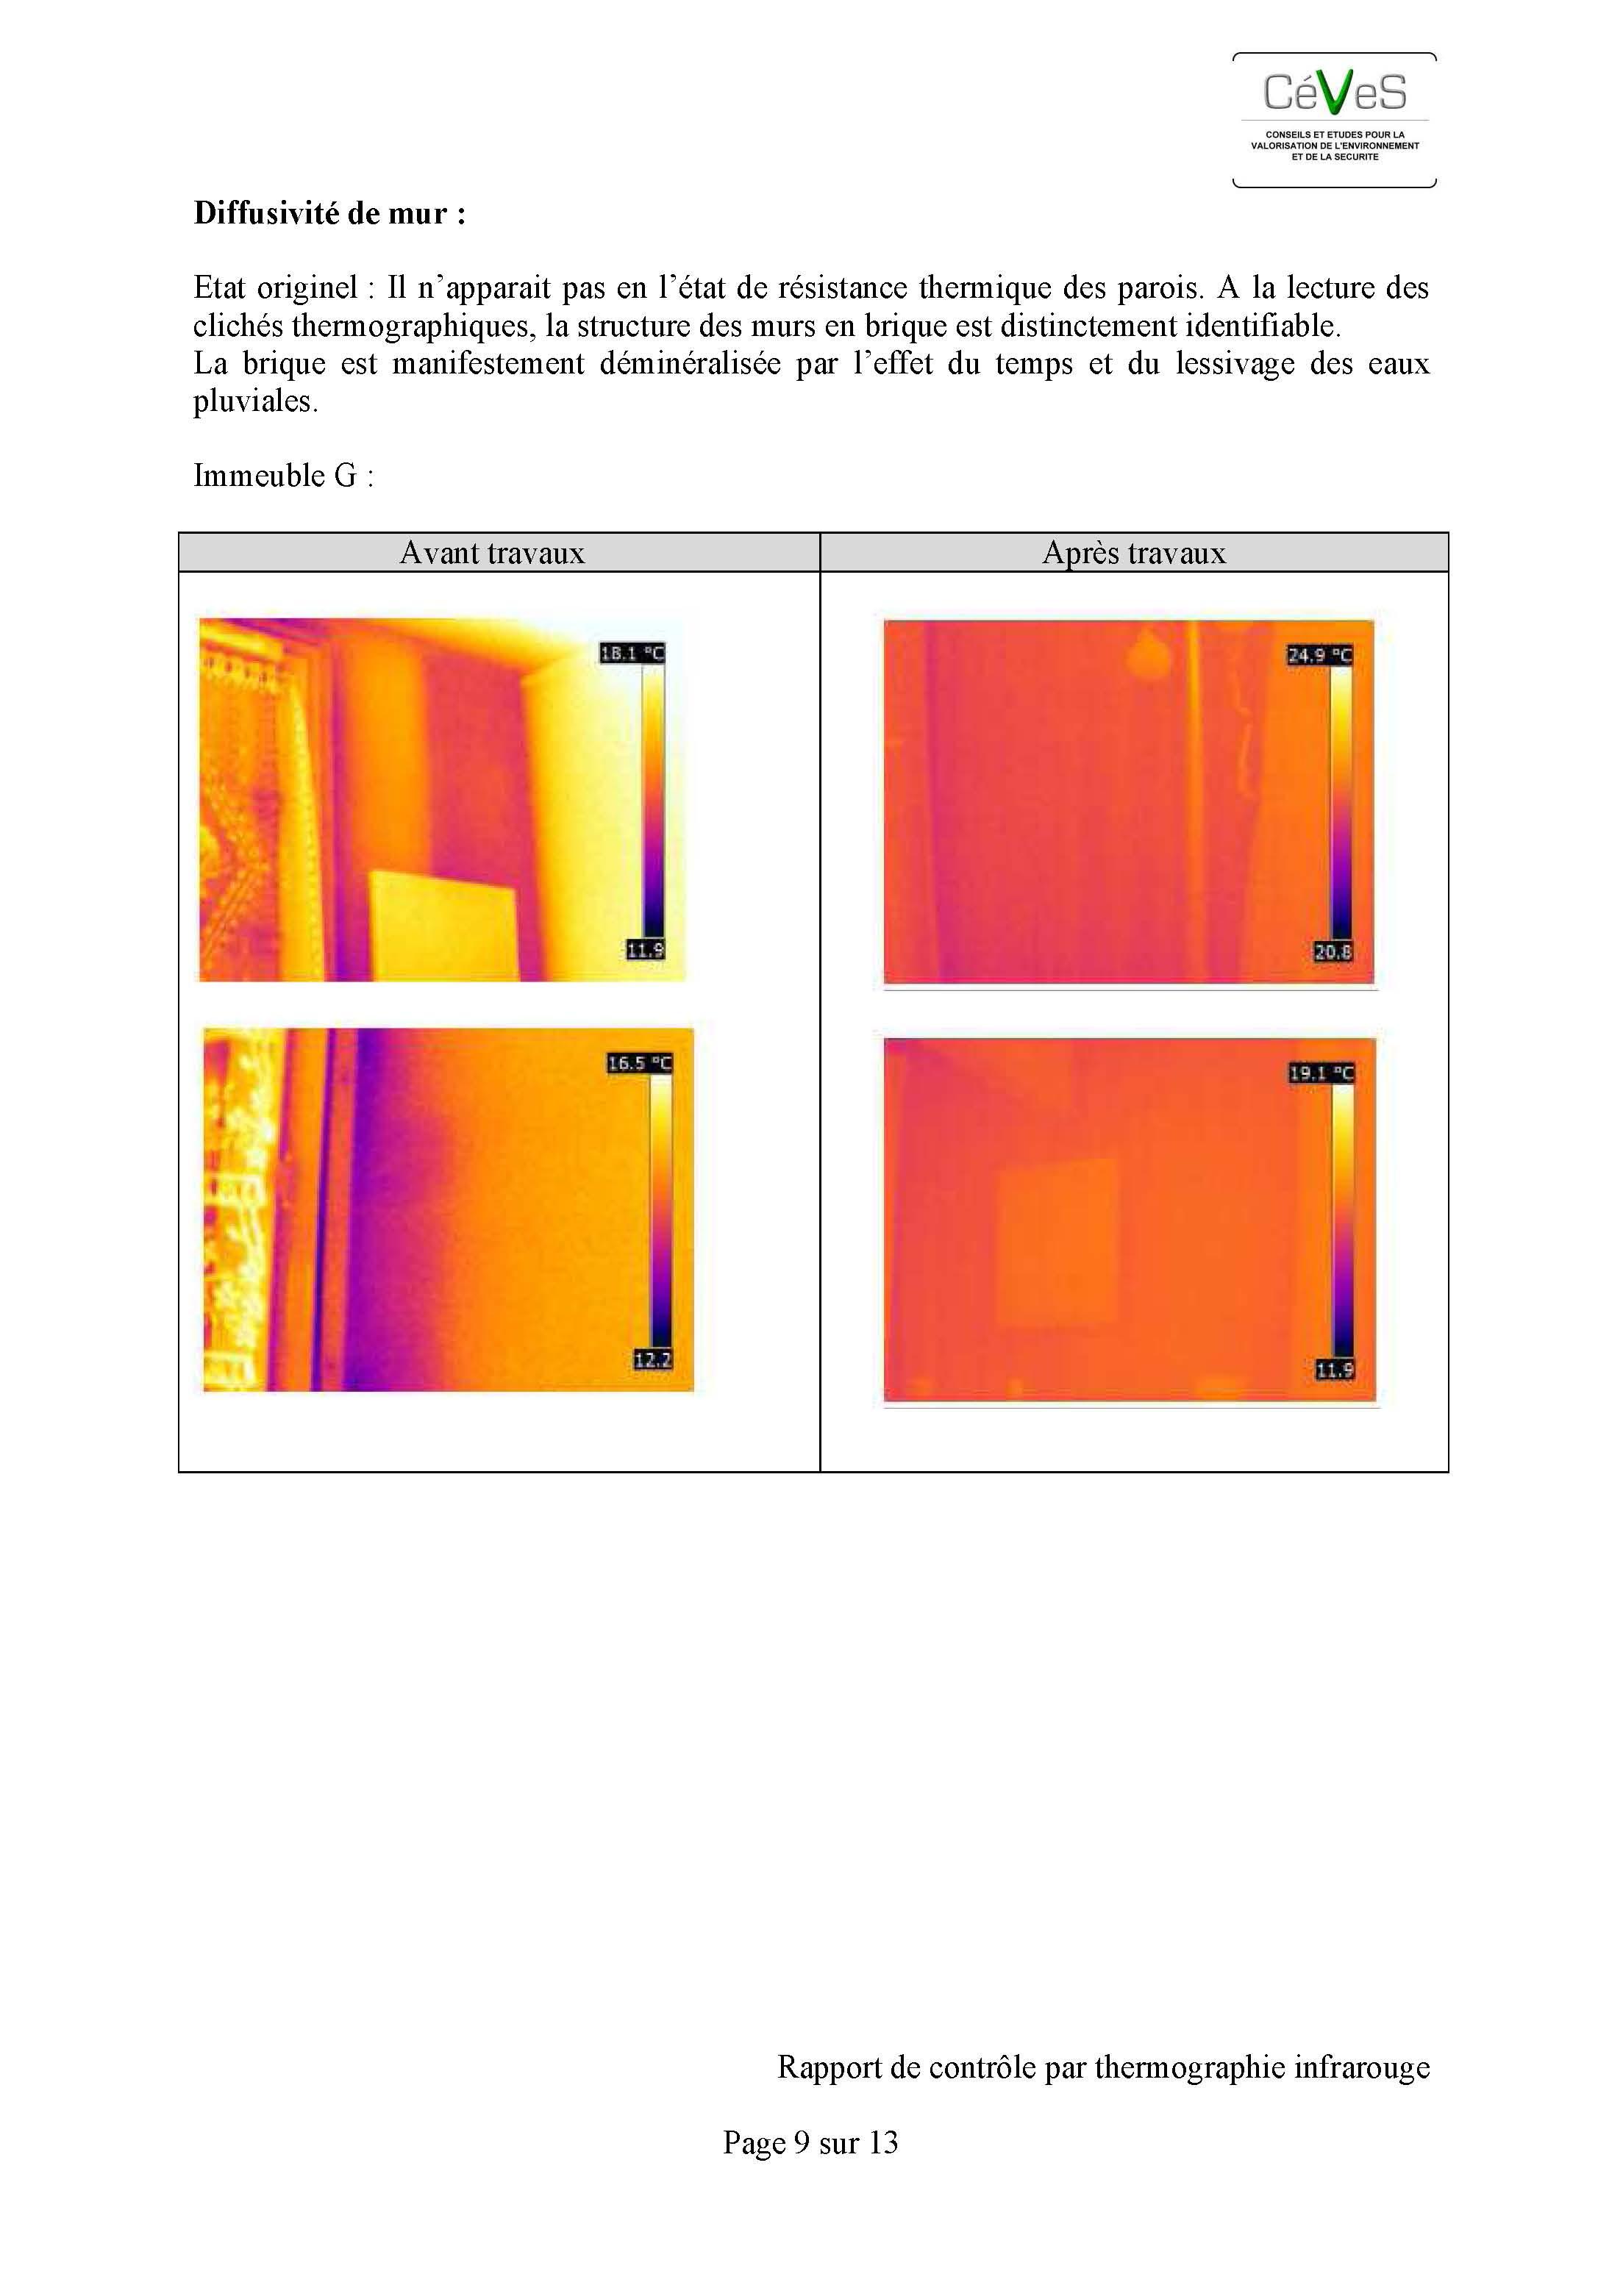 Rapport OPH Puteaux G et H v2_Page_09_1540313155730